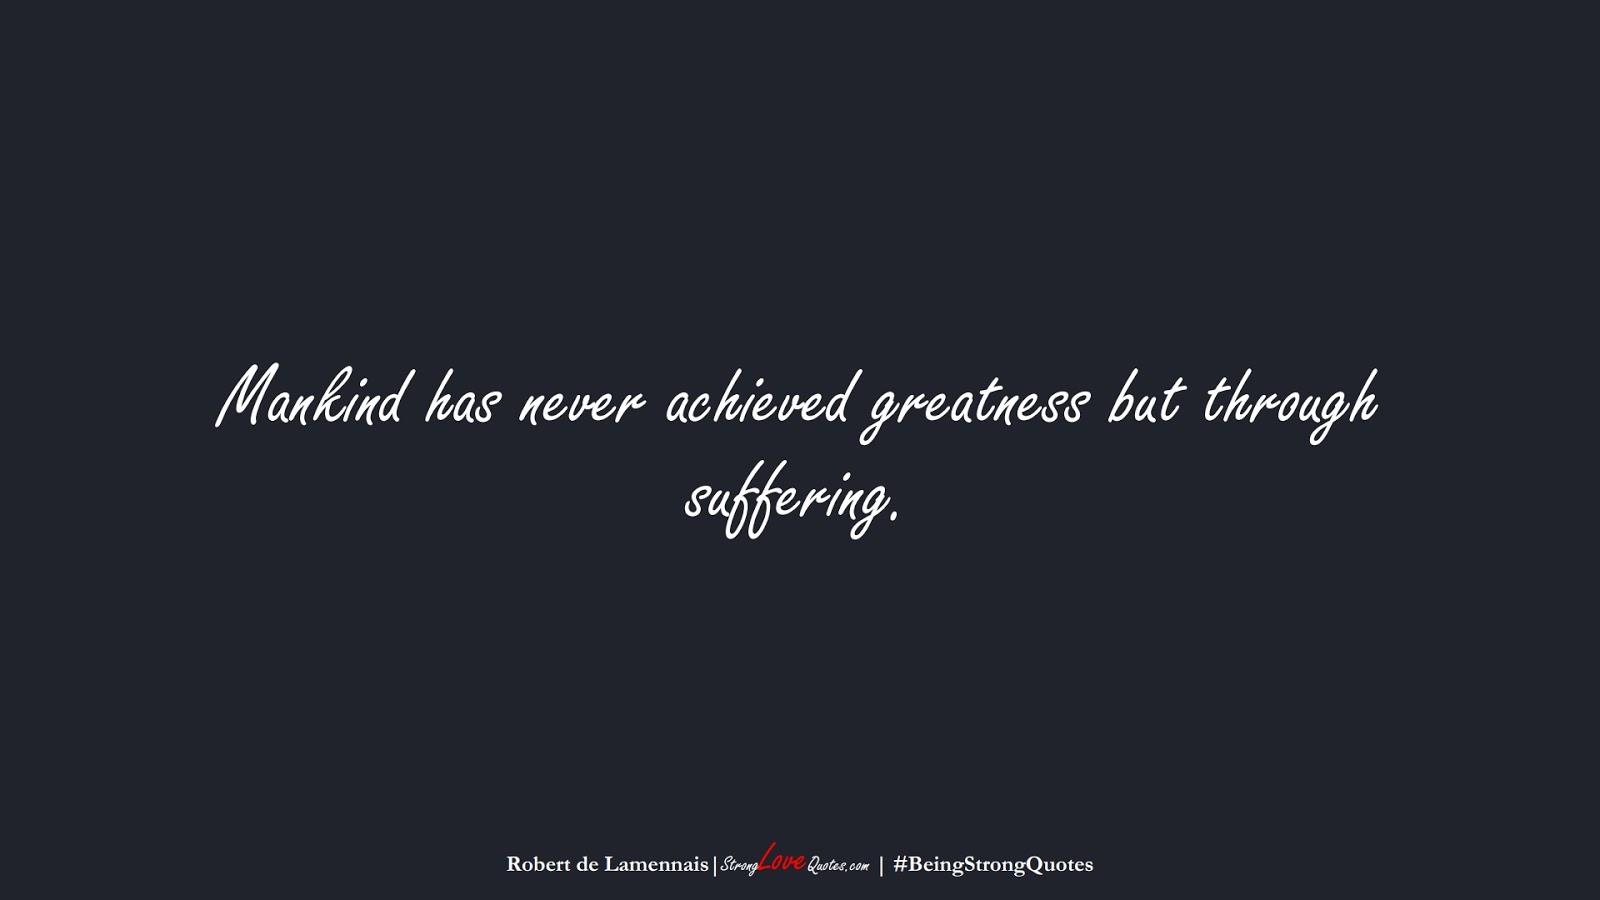 Mankind has never achieved greatness but through suffering. (Robert de Lamennais);  #BeingStrongQuotes